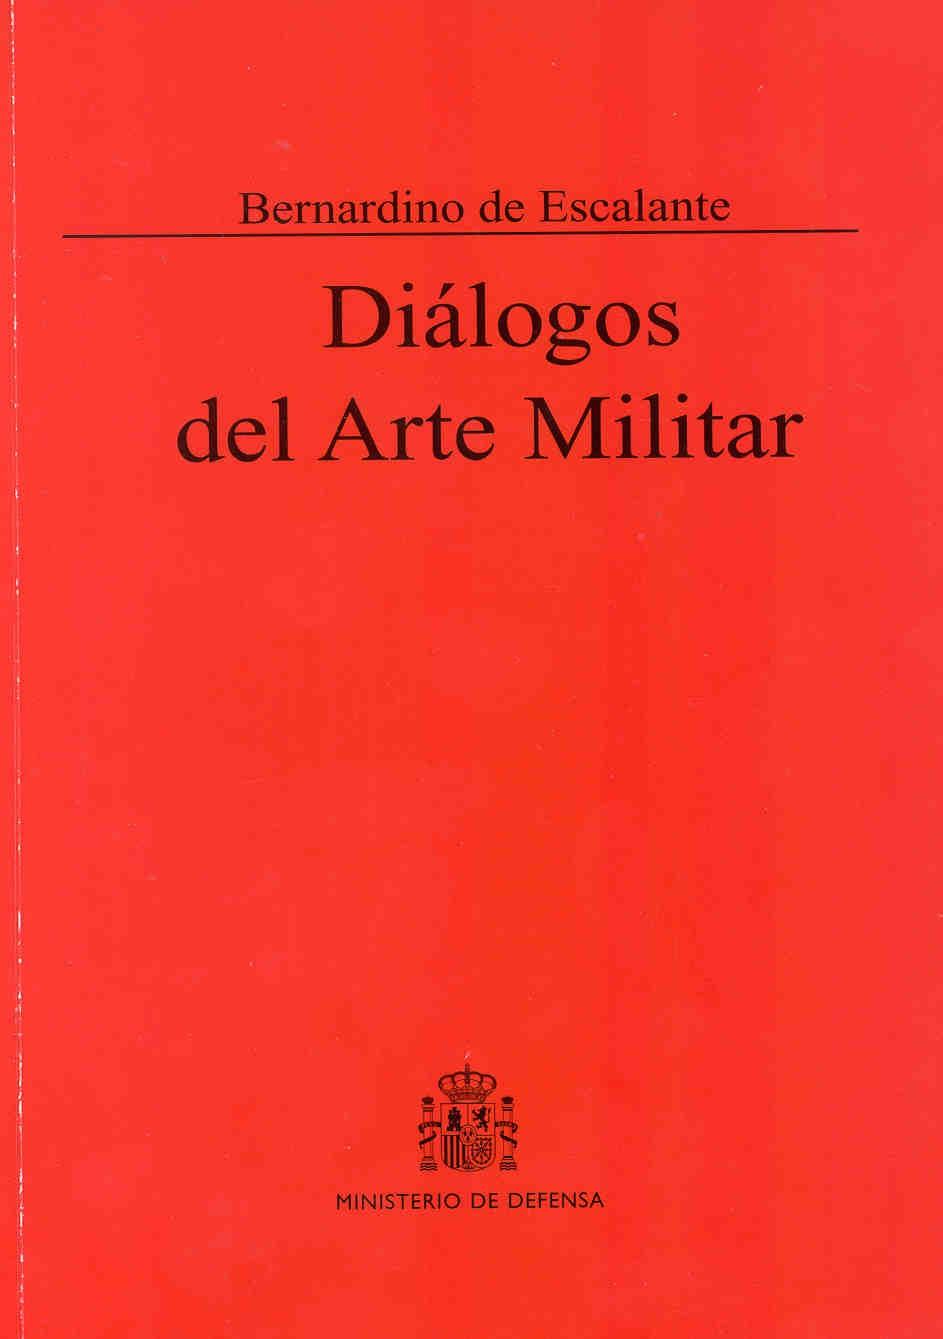 DIÁLOGOS DEL ARTE MILITAR